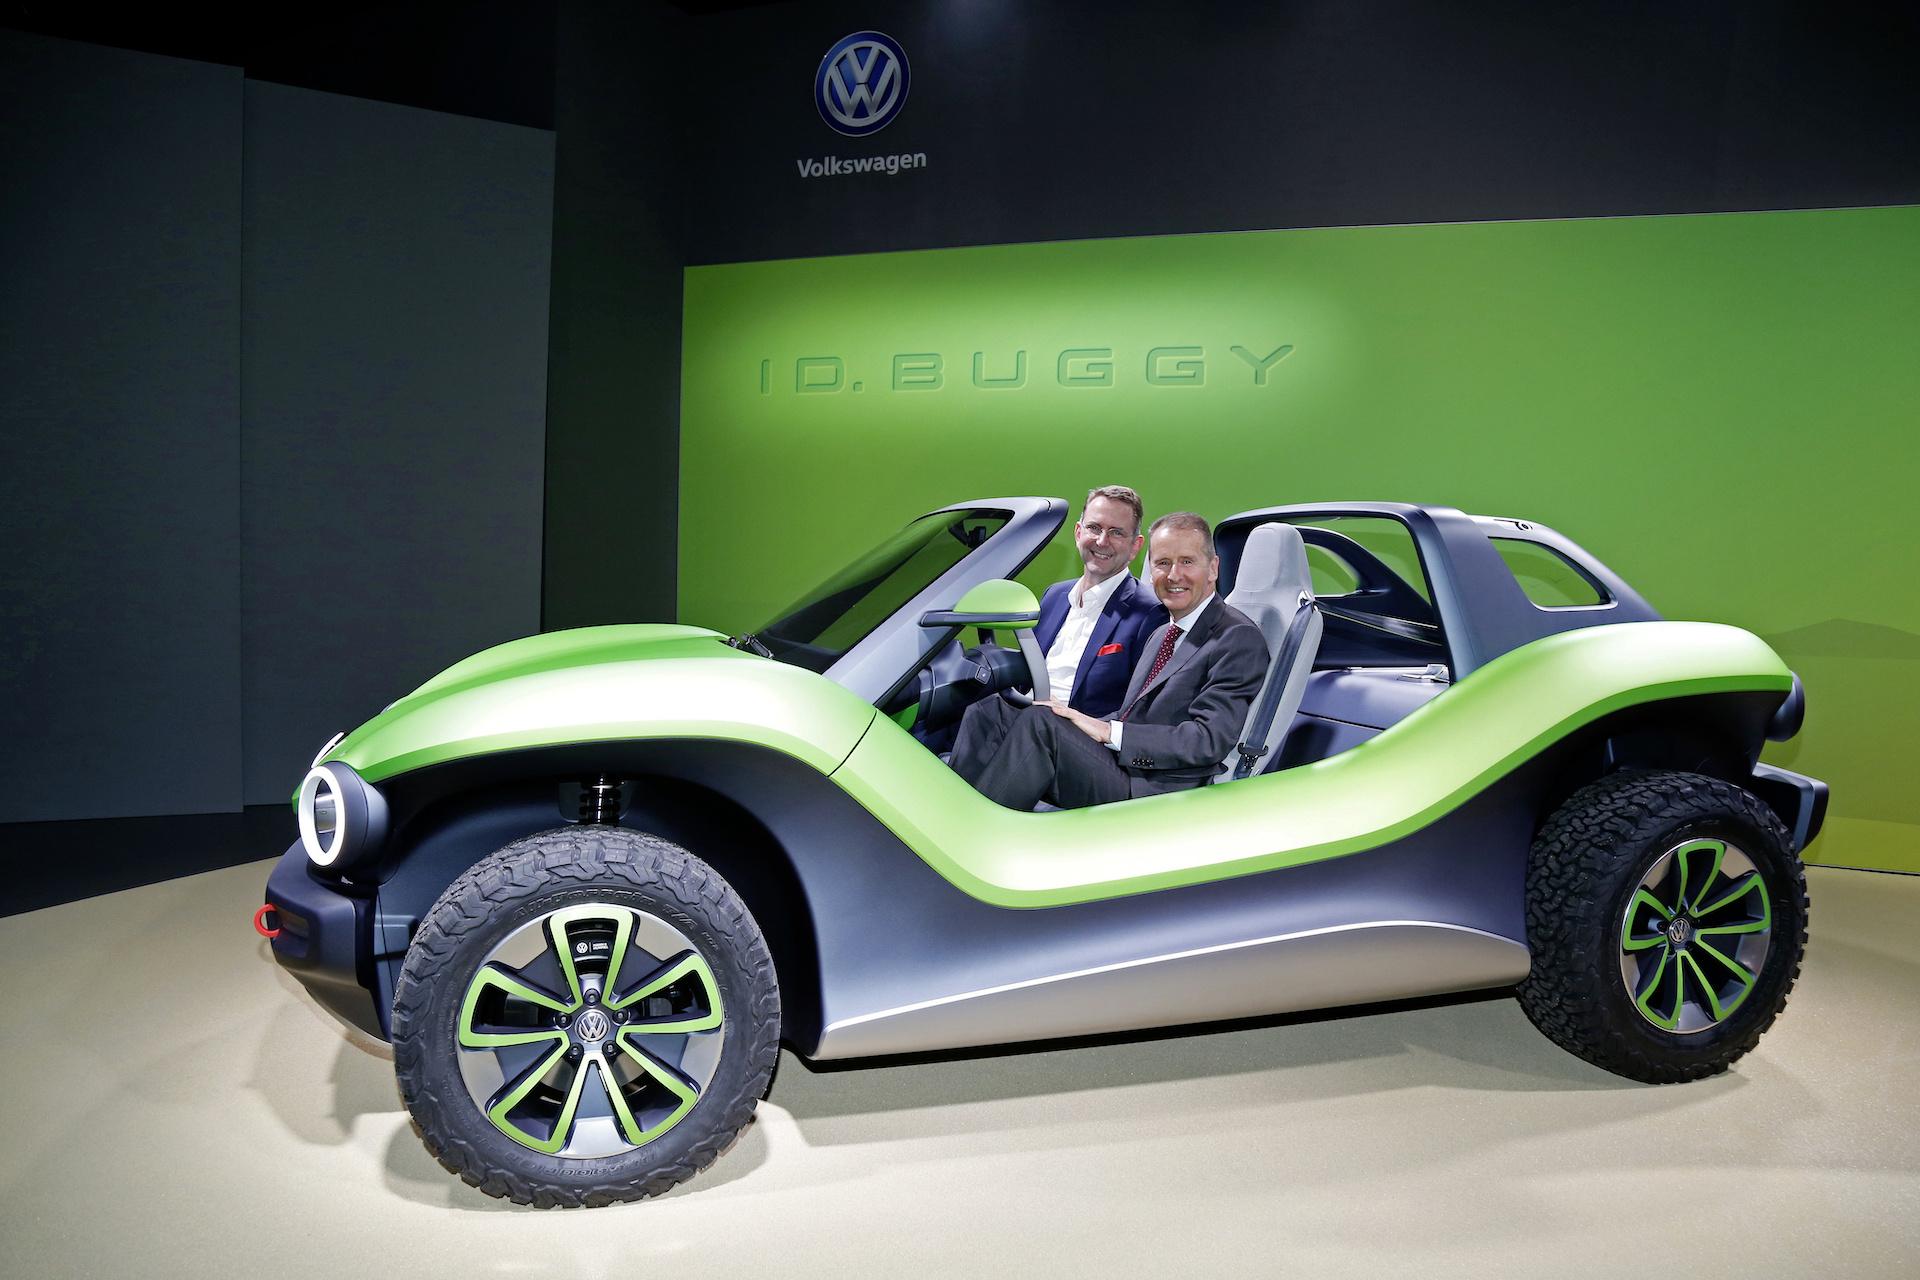 id buggy volkswagen pr ne l 39 ouverture avec son buggy de. Black Bedroom Furniture Sets. Home Design Ideas